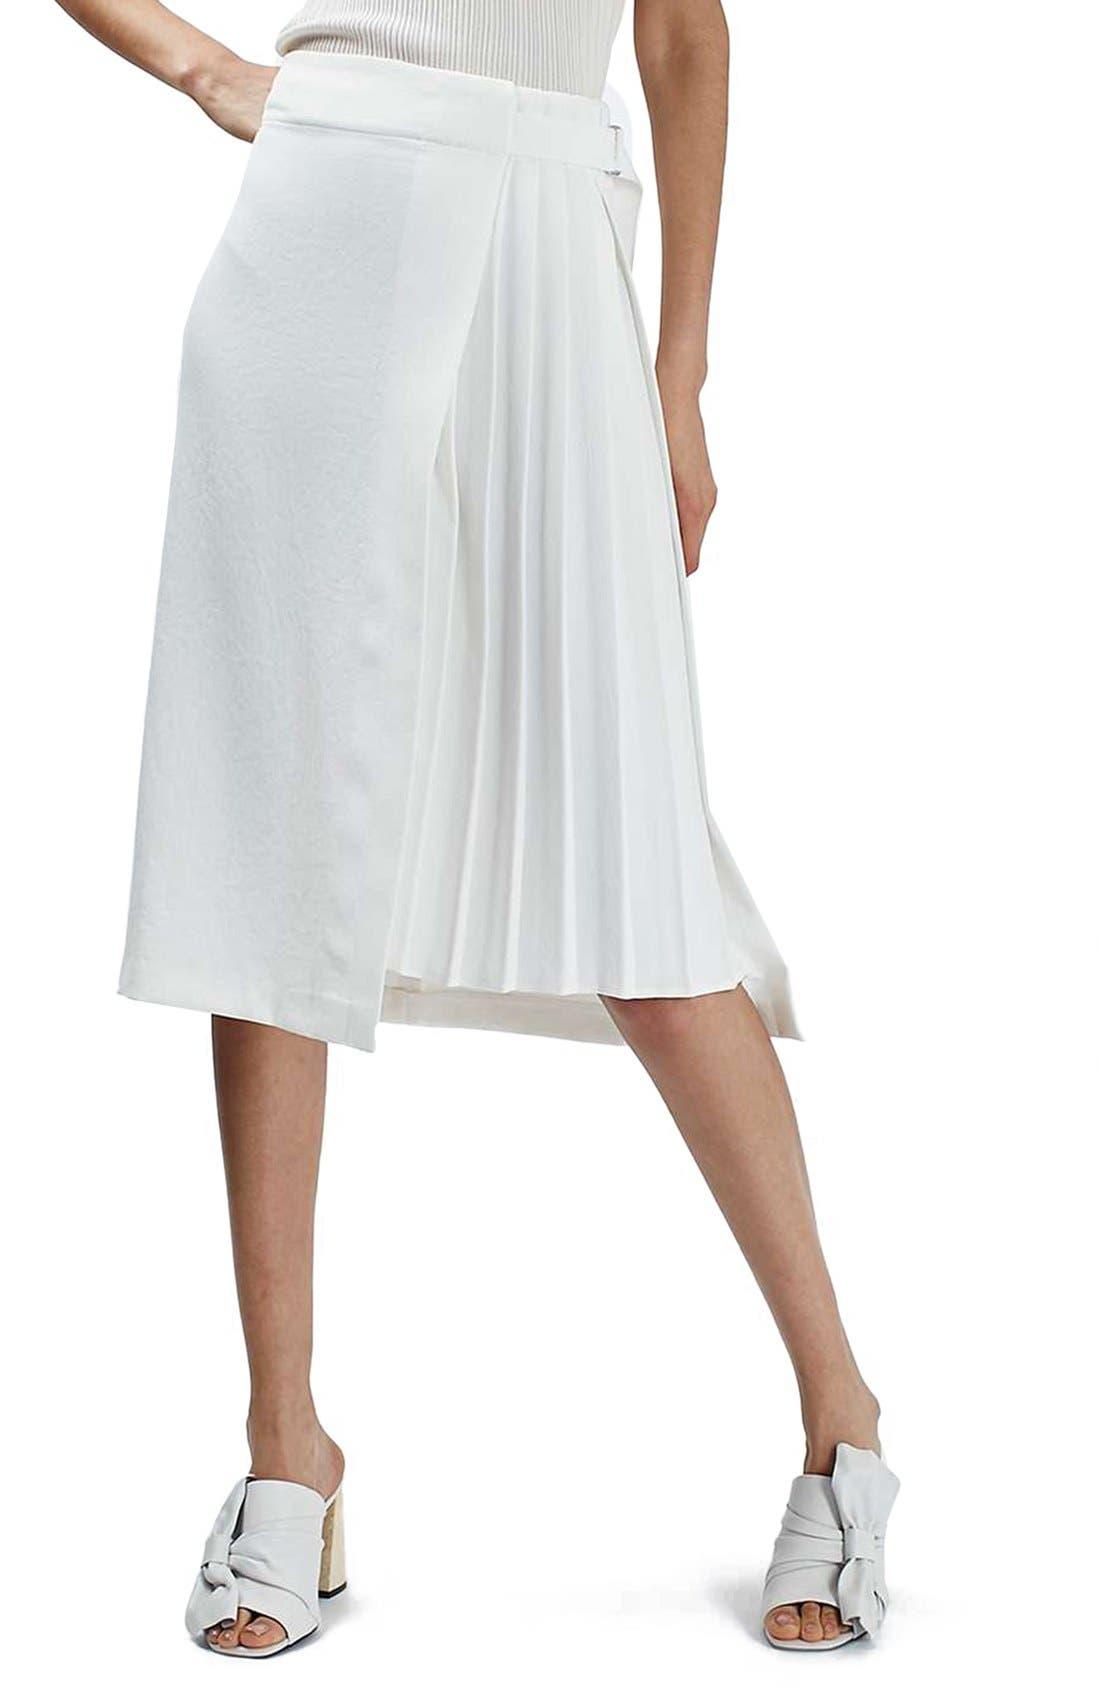 Alternate Image 1 Selected - Topshop Pleat Detail Wrap Midi Skirt